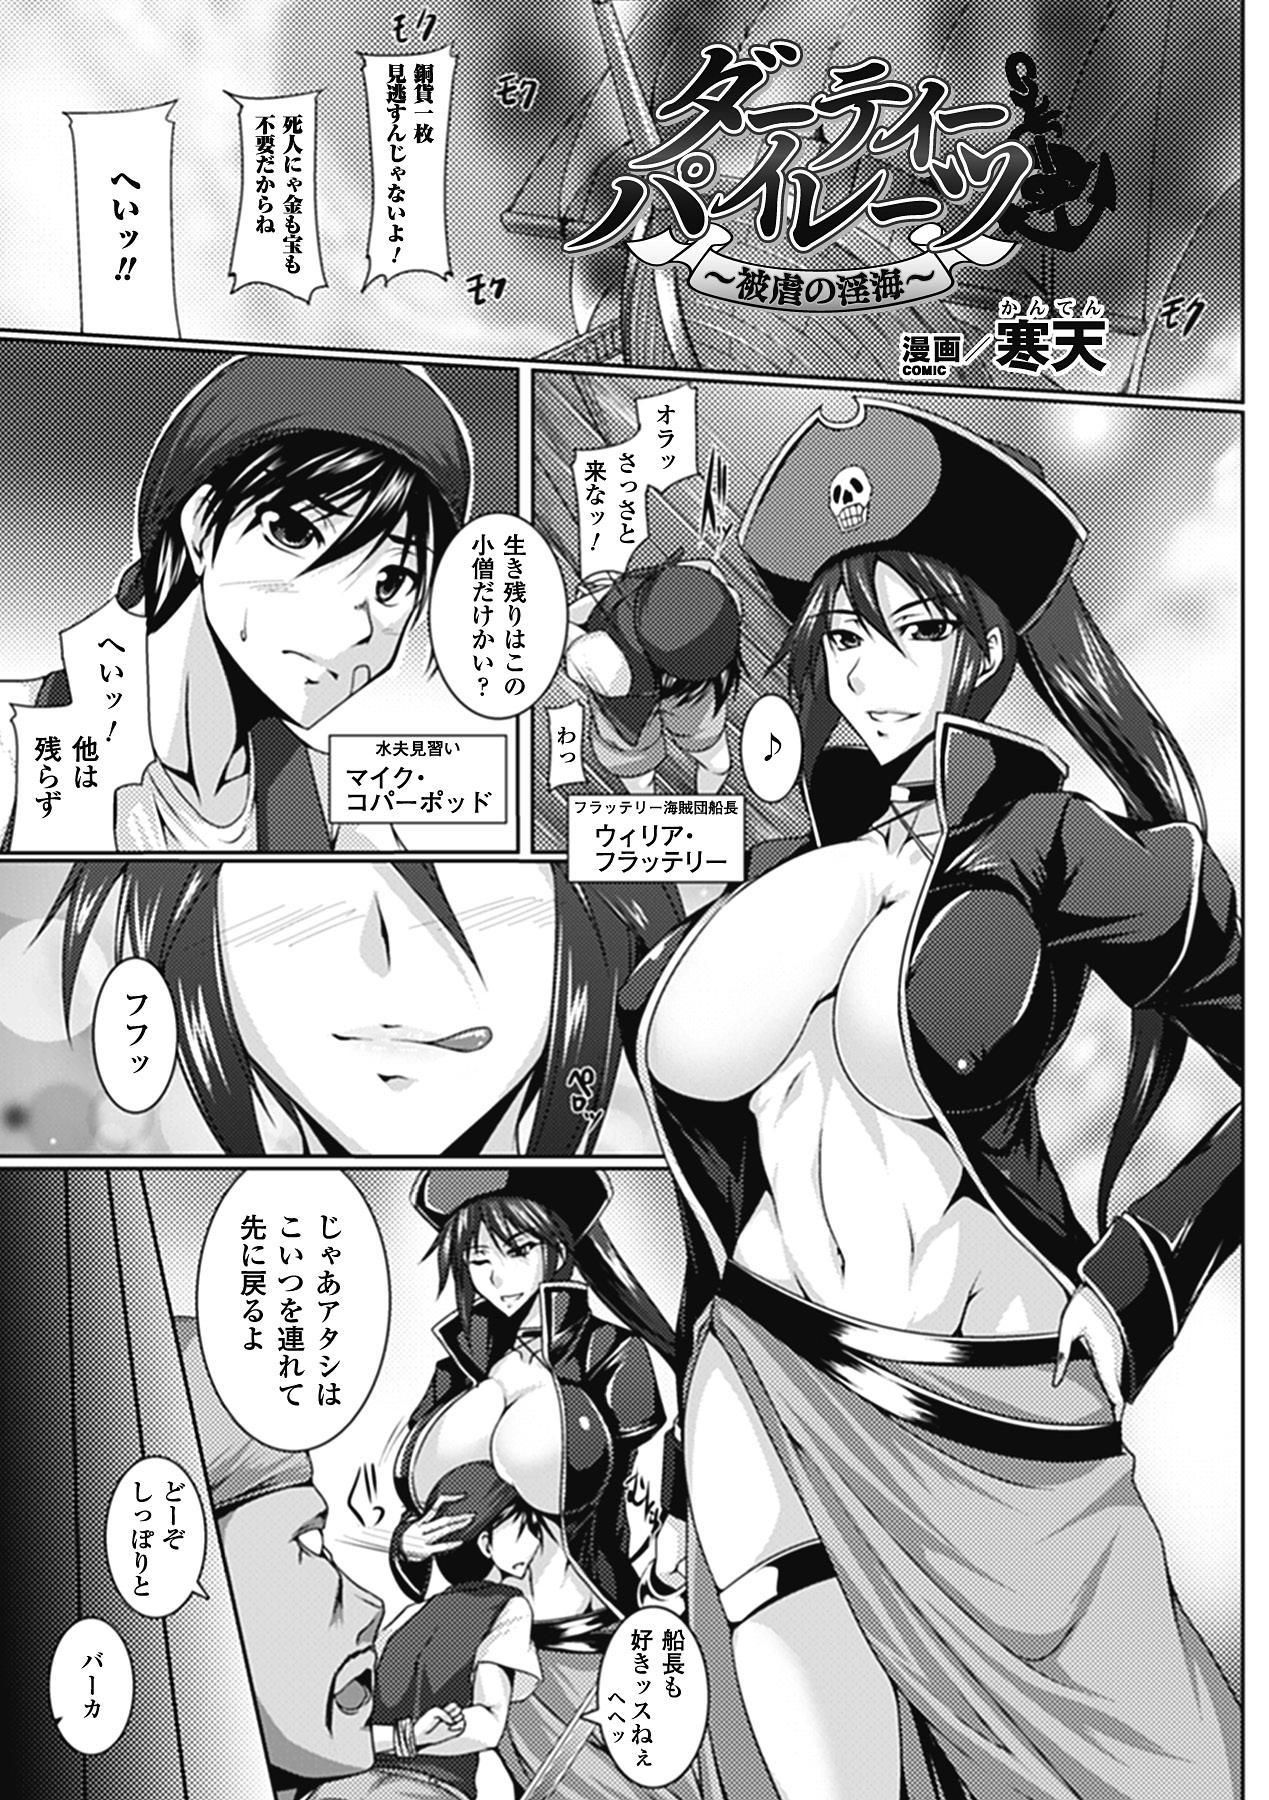 Megami Crisis 1 177